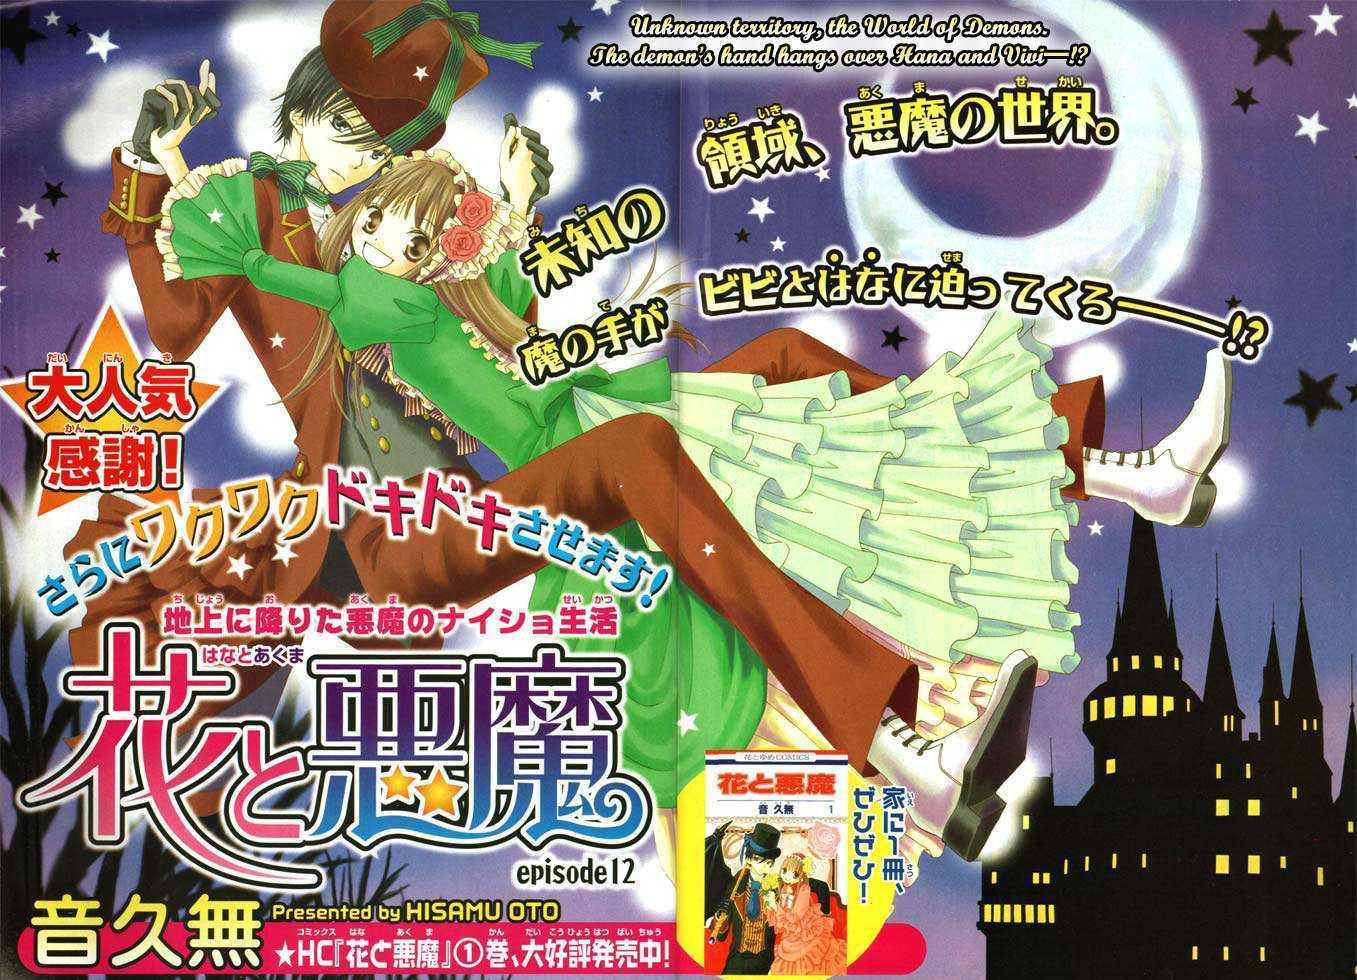 https://im.nineanime.com/comics/pic9/30/7390/129792/HanatoAkuma120728.jpg Page 1